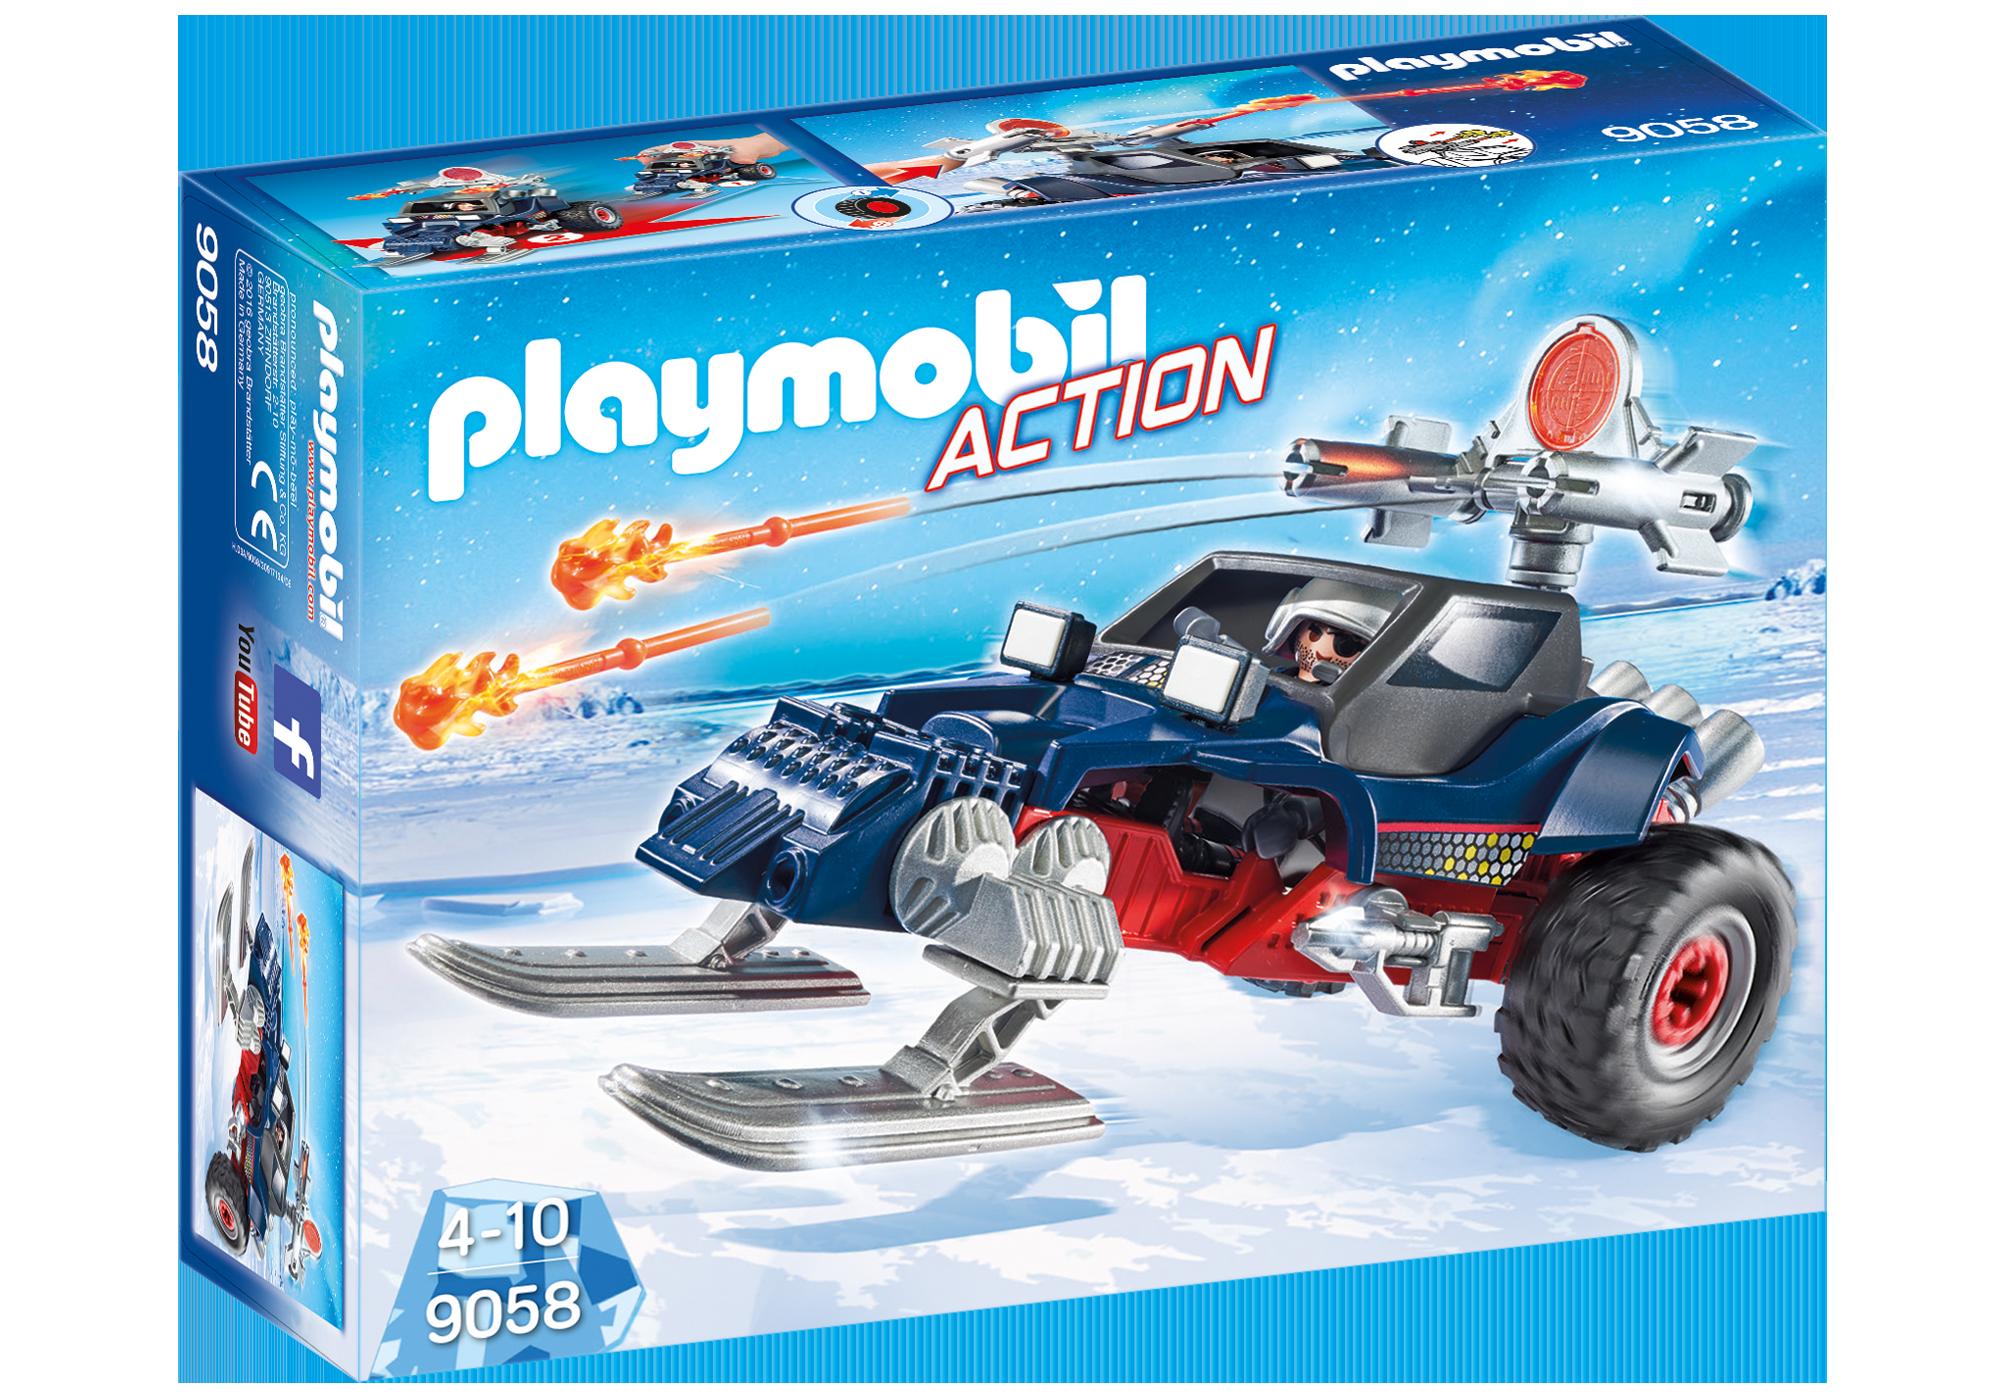 http://media.playmobil.com/i/playmobil/9058_product_box_front